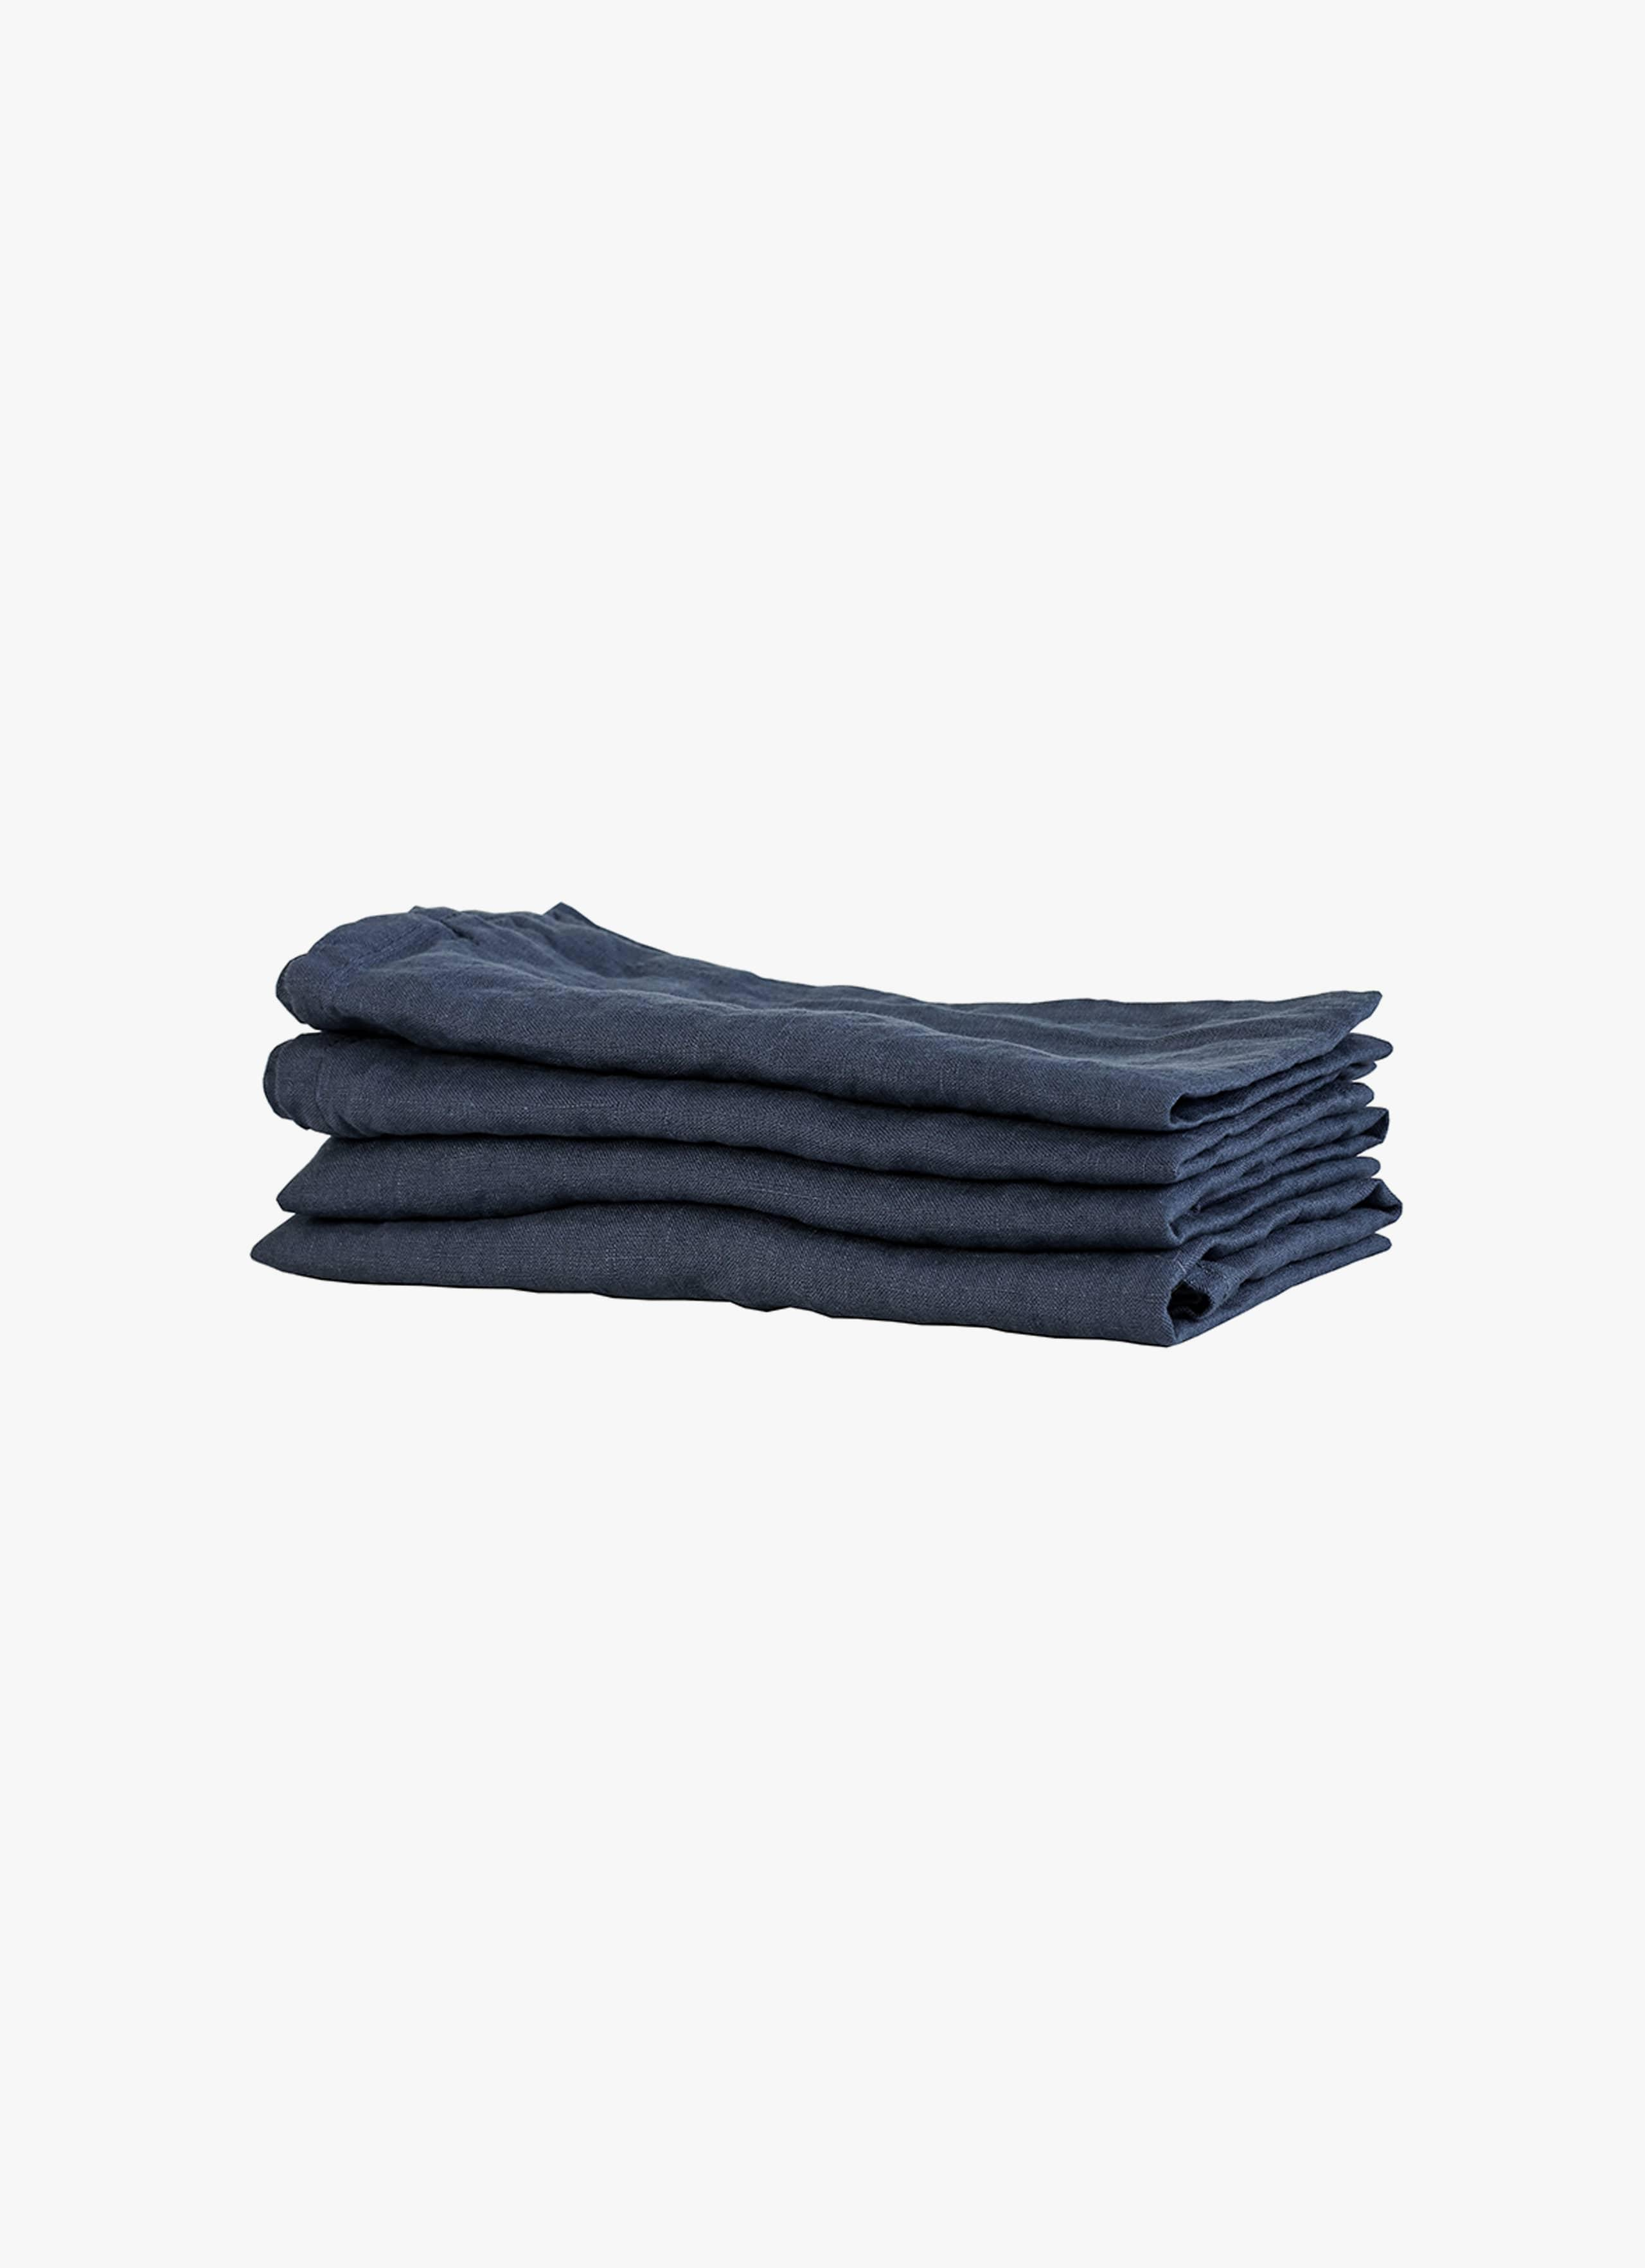 Tell Me More - Linen Napkin - Midnight Blue